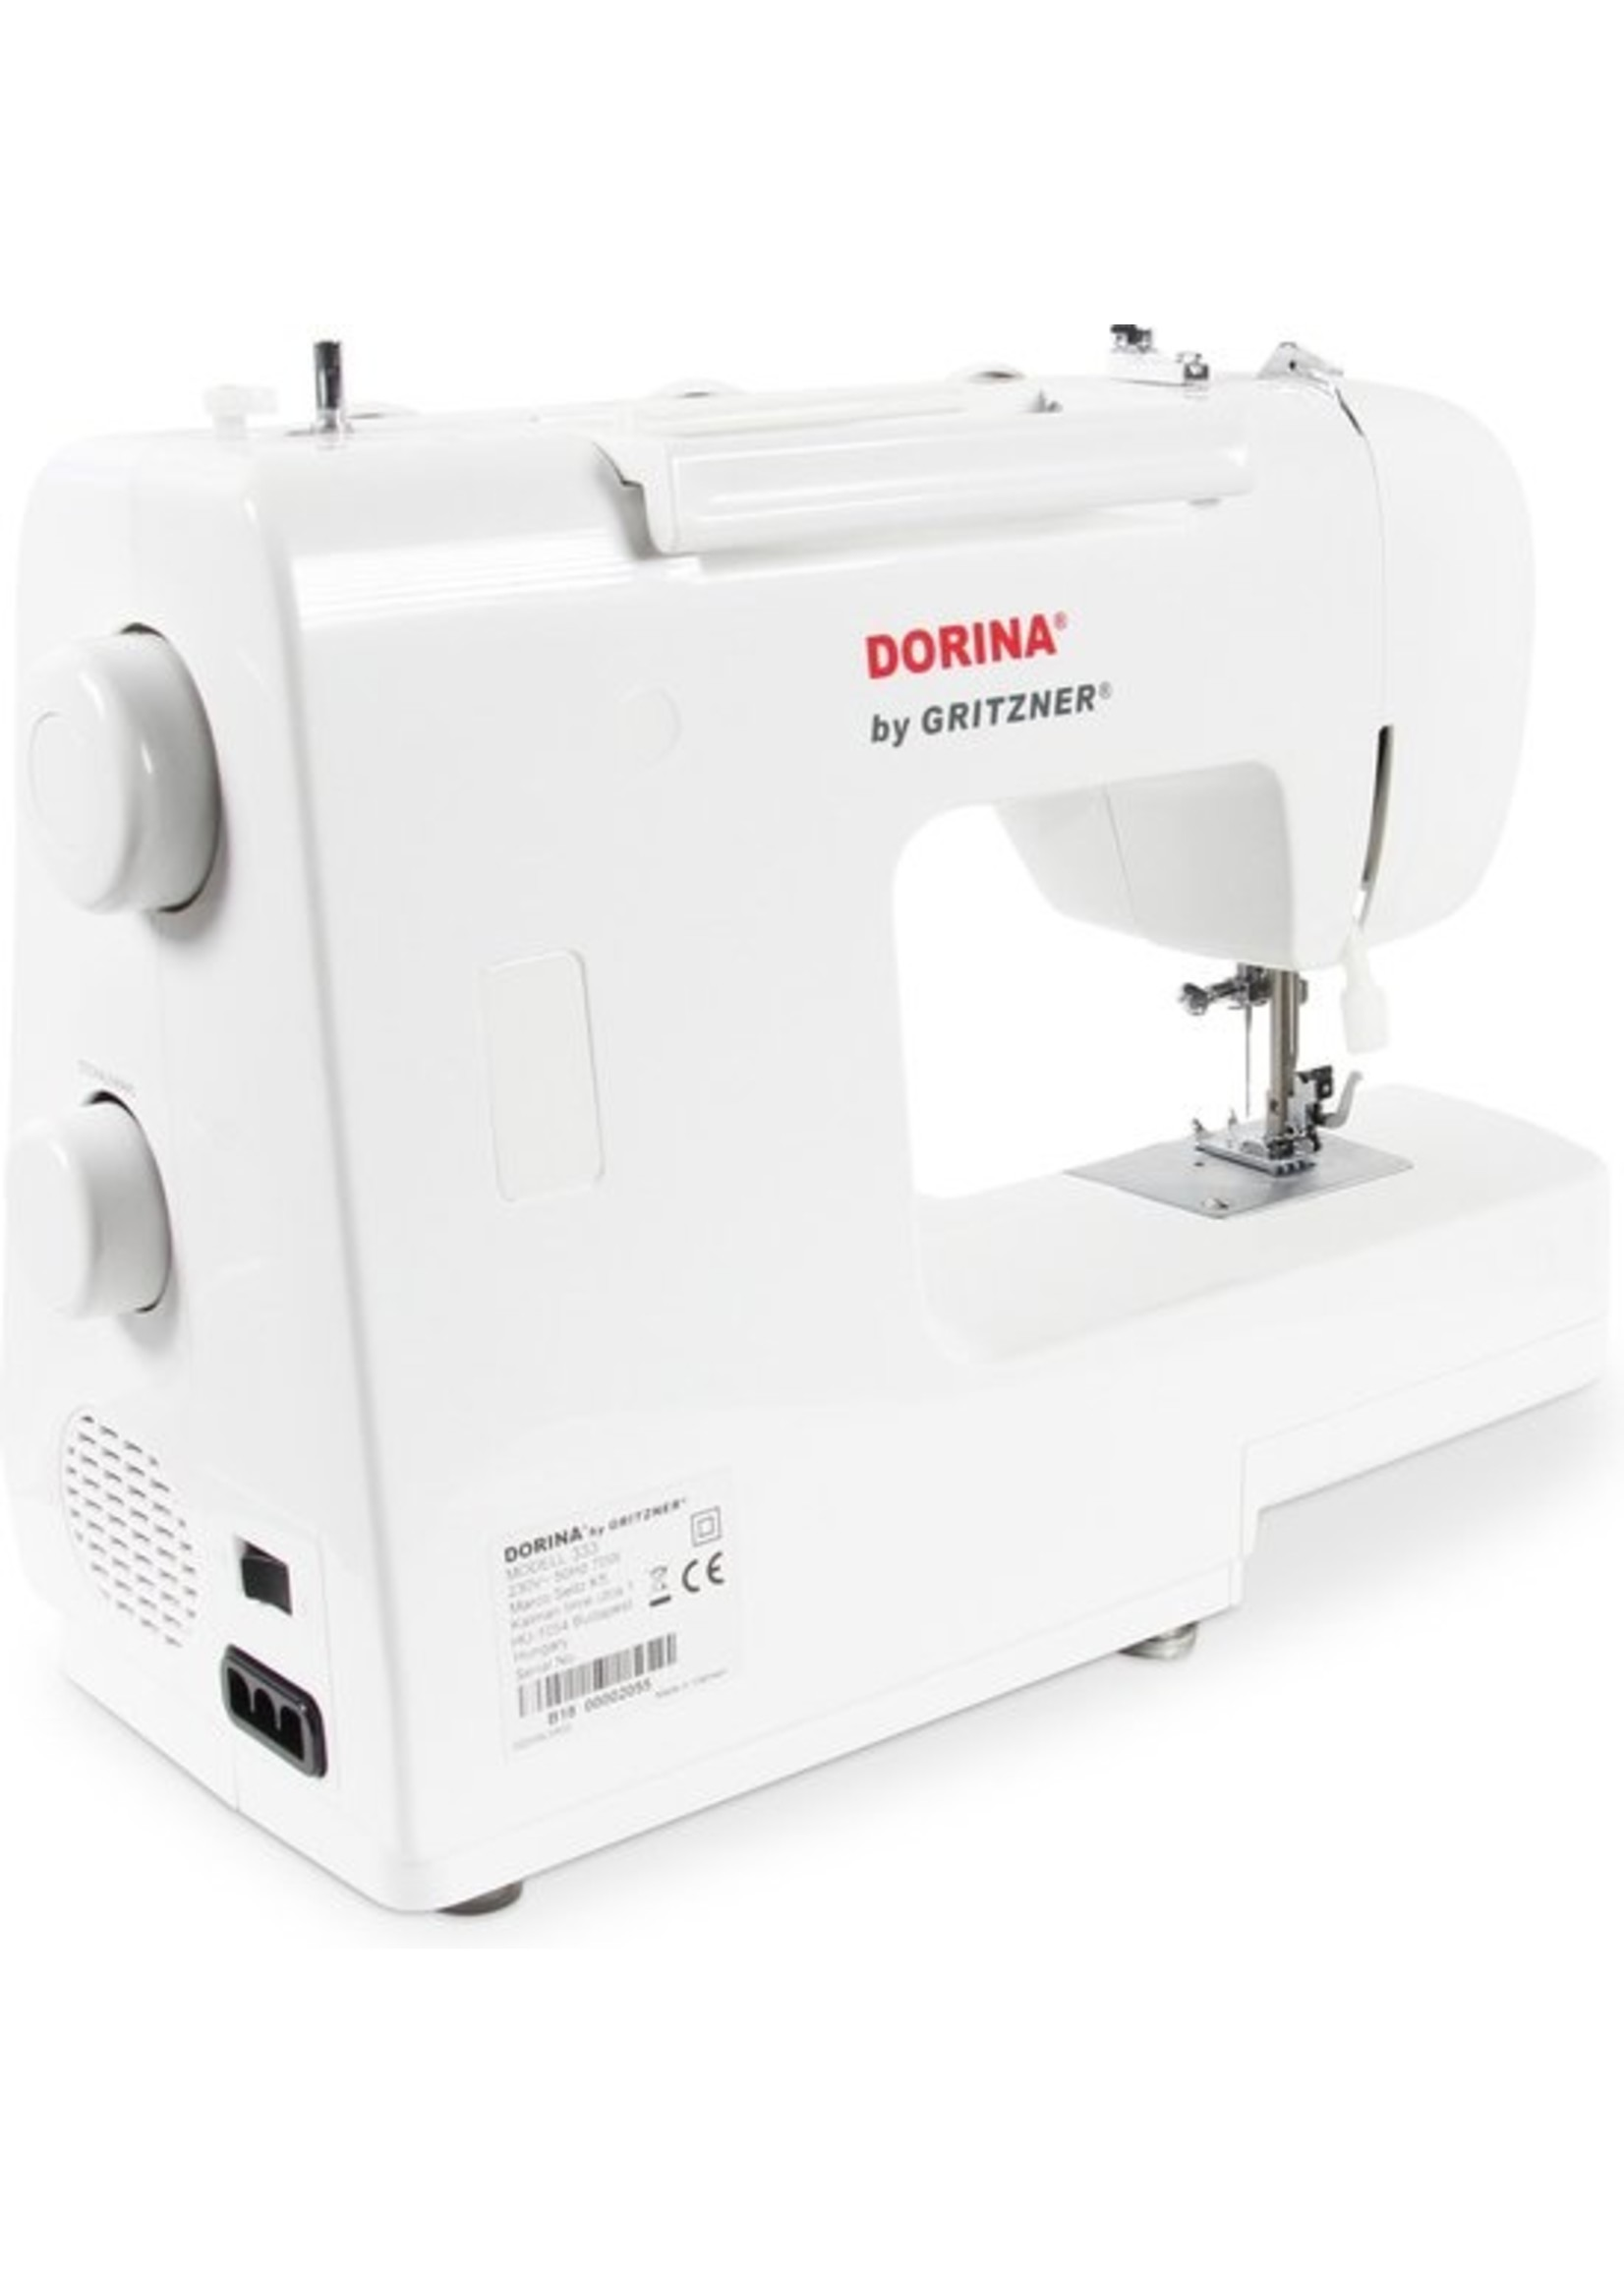 Gritzner Dorina by Gritzner 333 Naaimachine